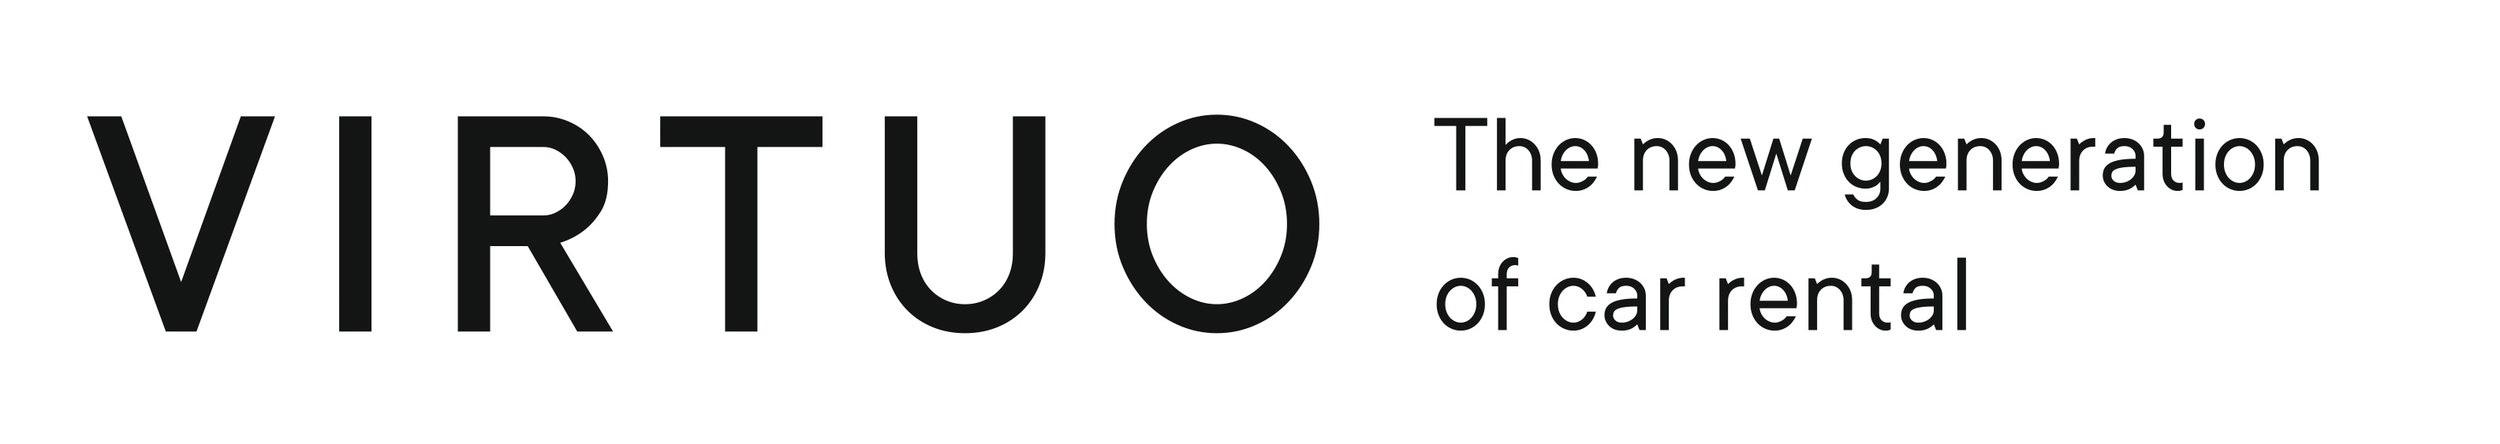 logo+virtuo.jpg